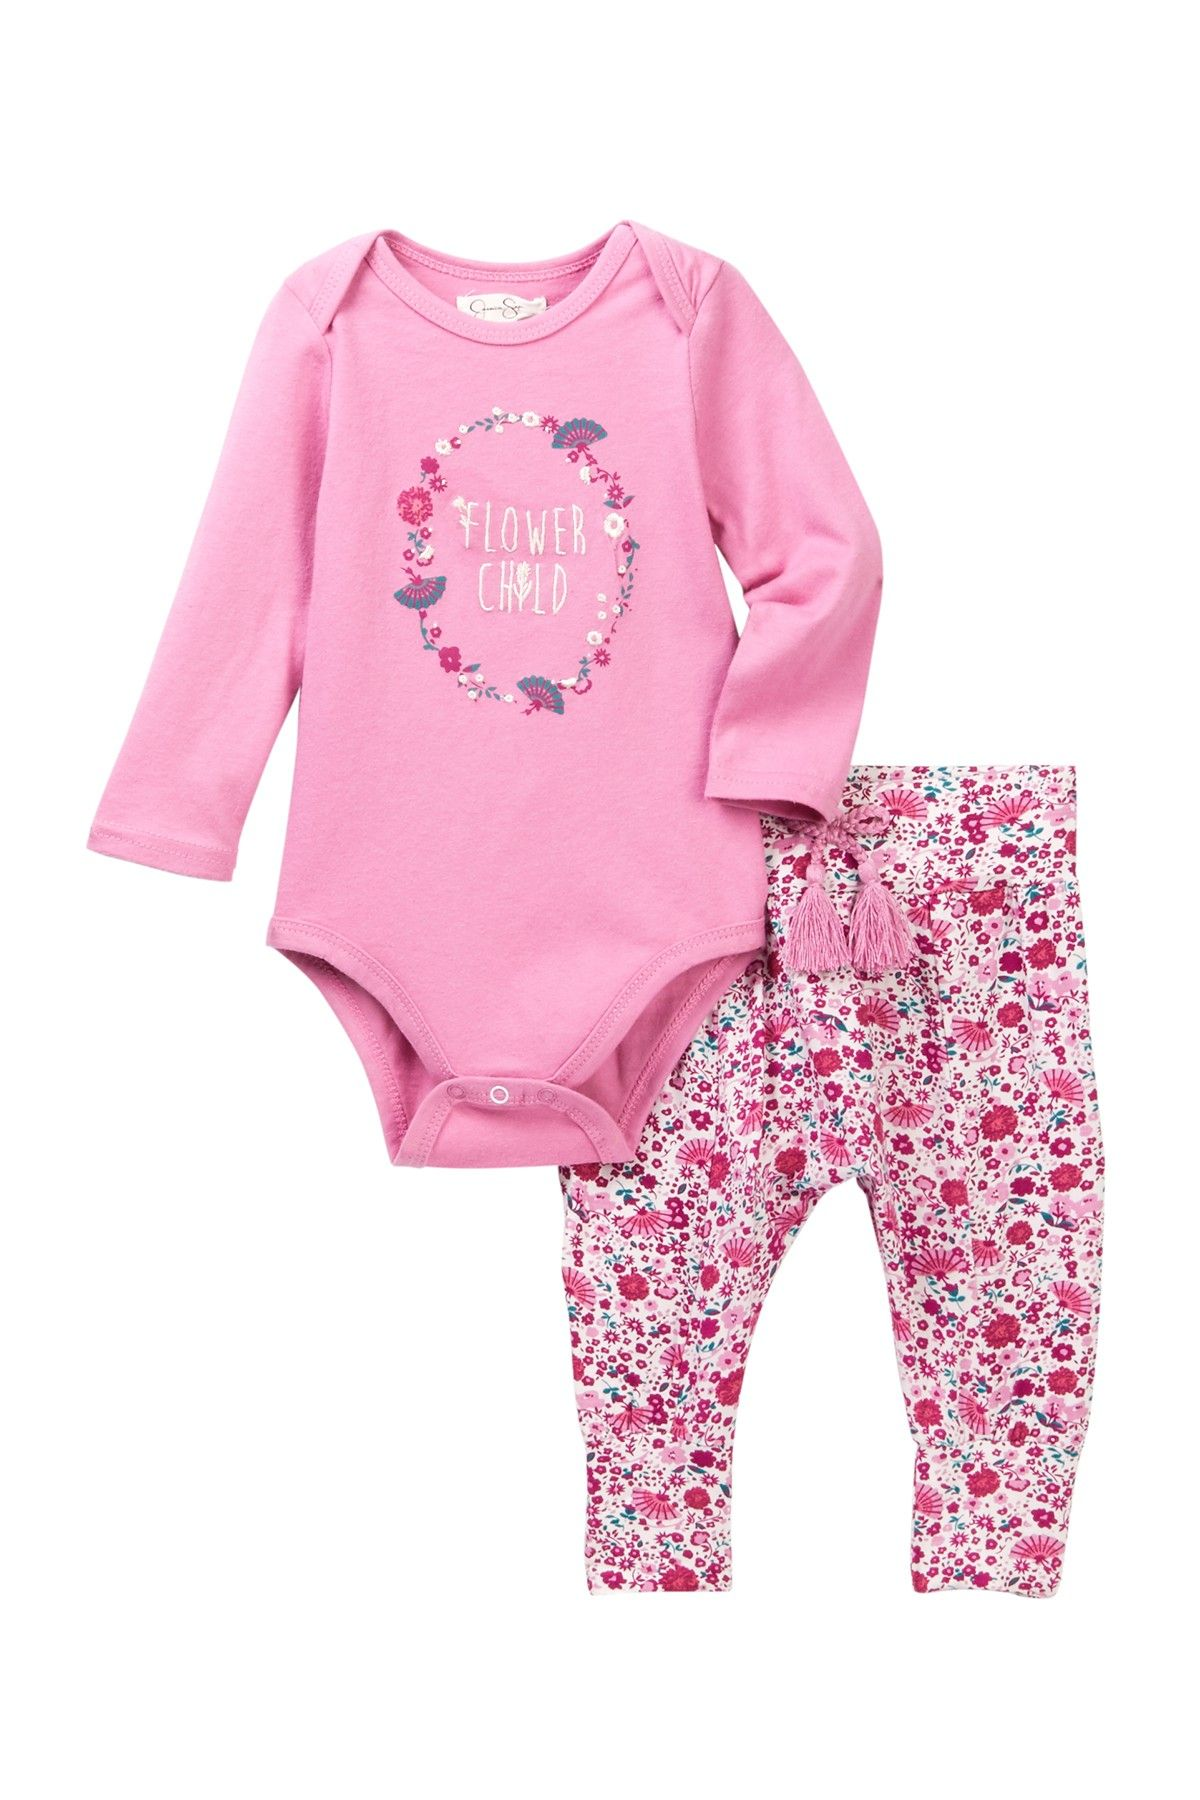 Jessica Simpson Girls Pants Set Pants Set